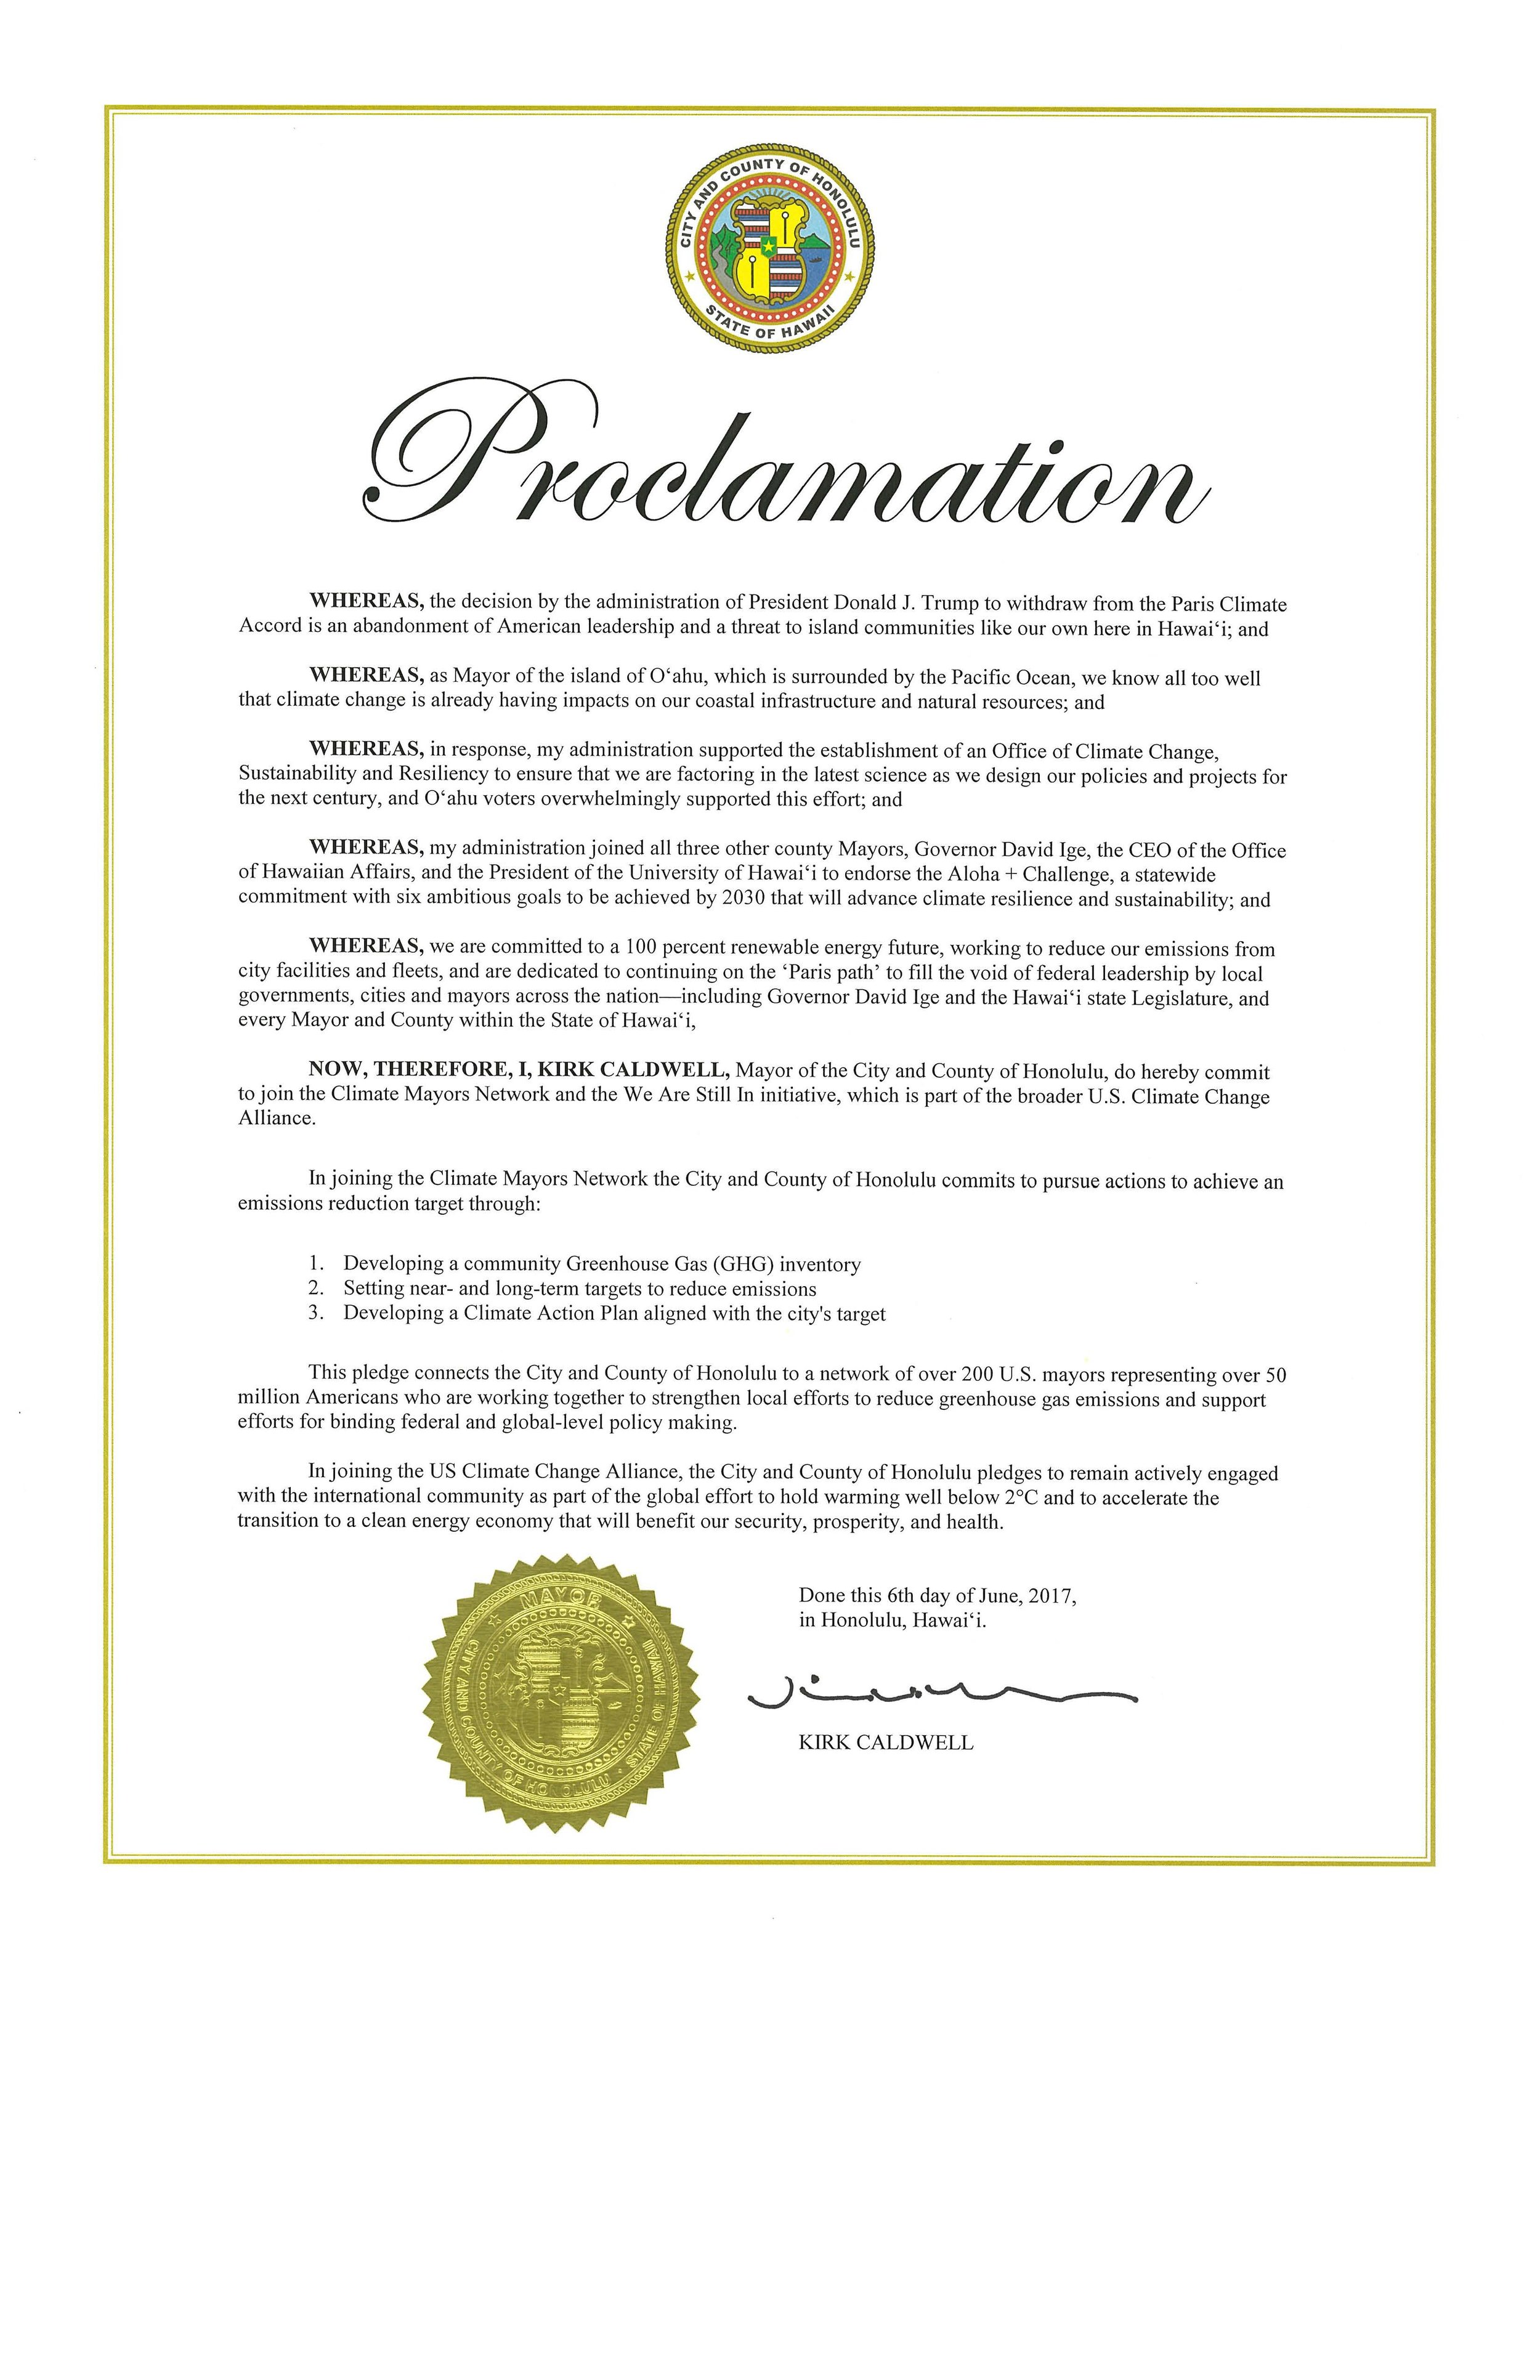 Mayor's Paris Accord Proclamation June 2017.jpg